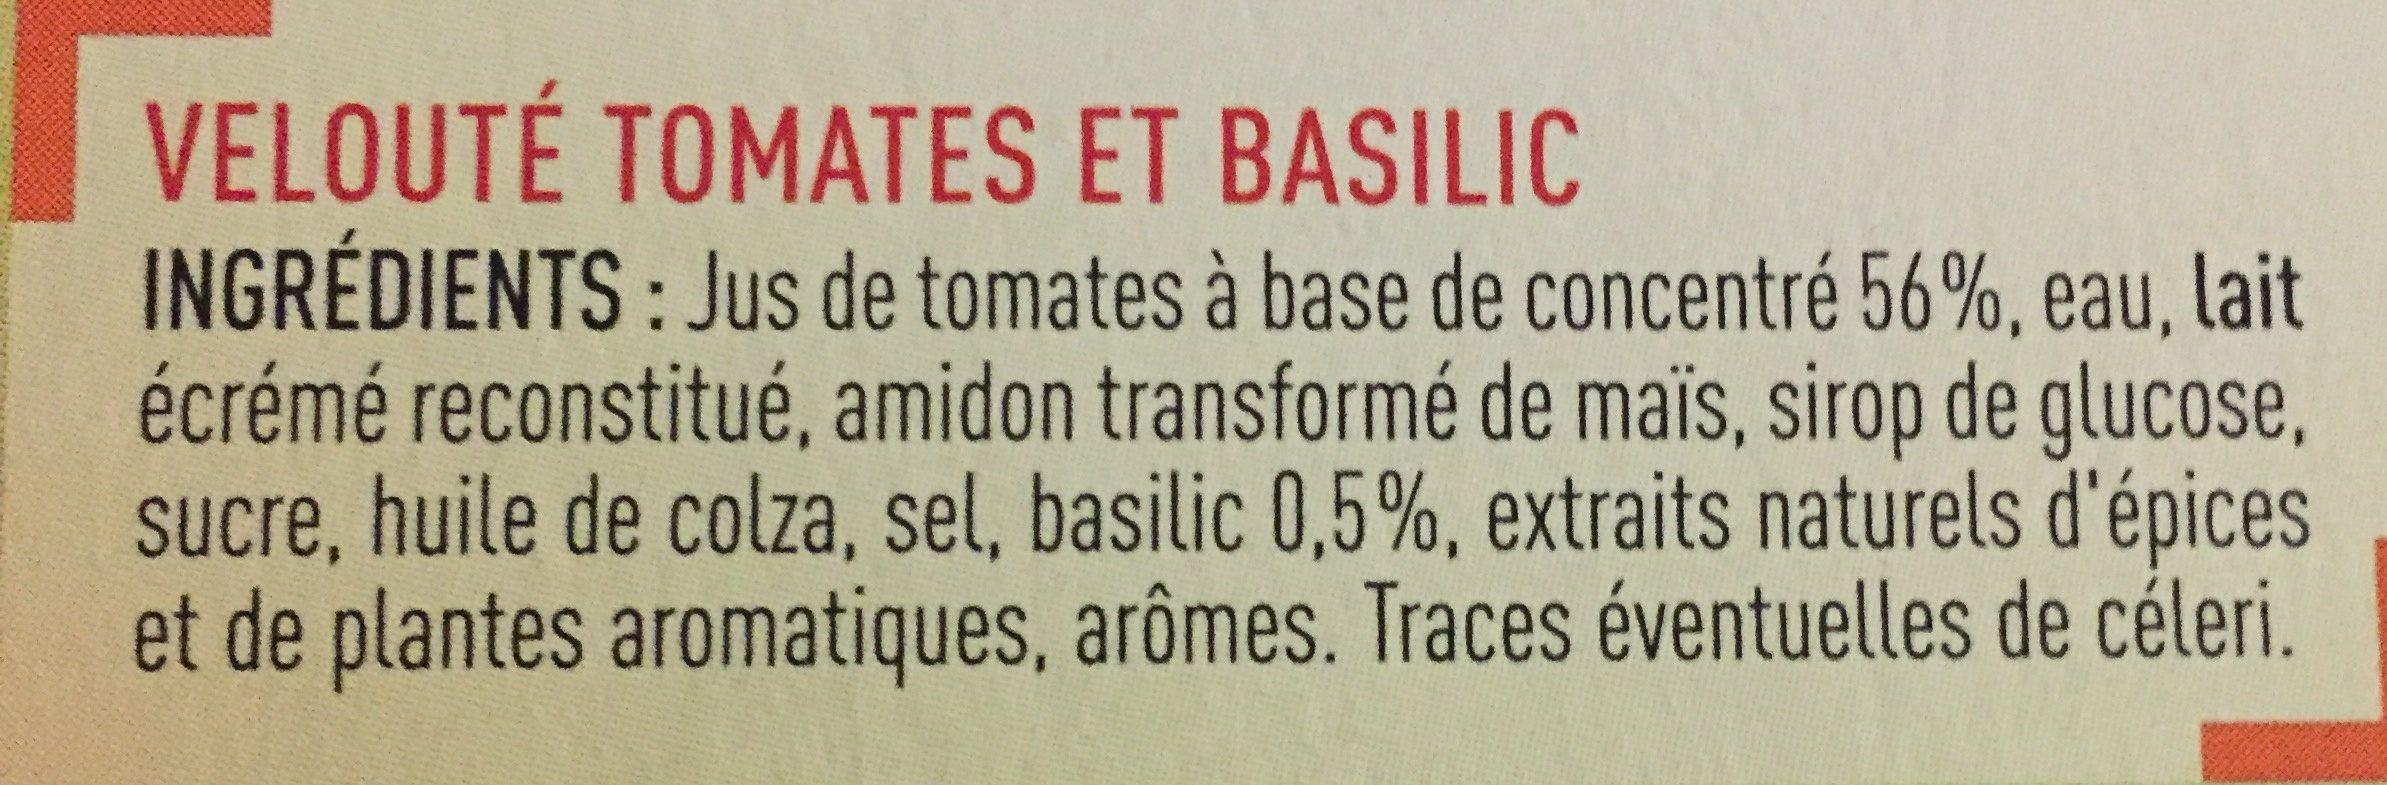 Veloute tomates basilic - Ingredients